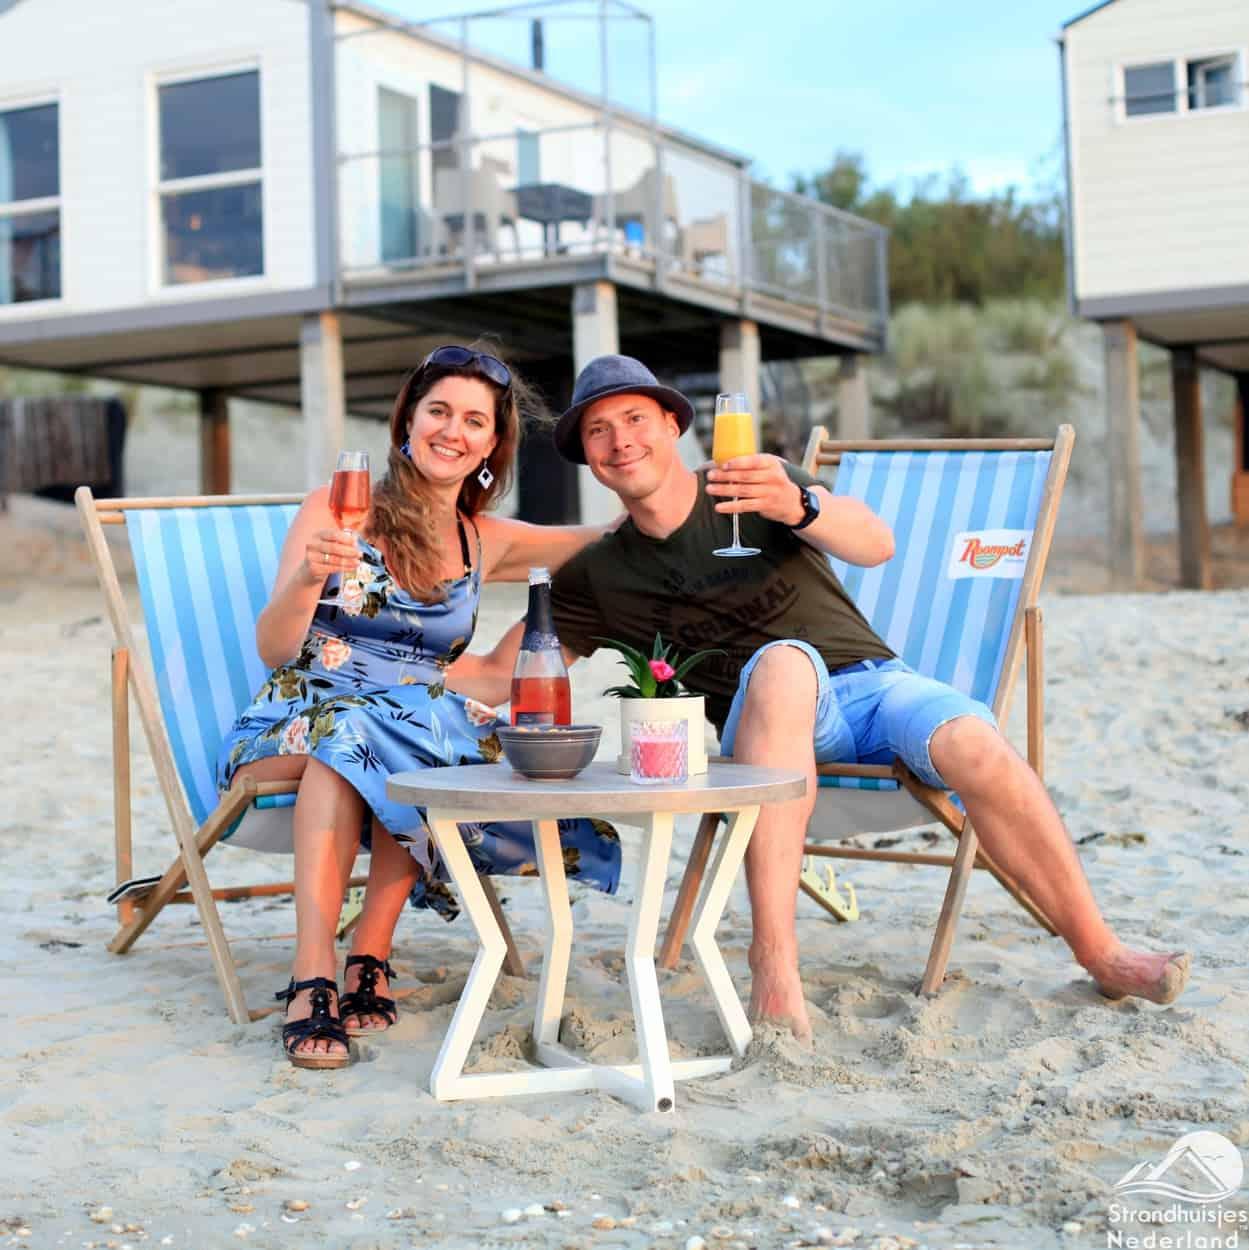 Toast am Strand beherbergt Kamperland.